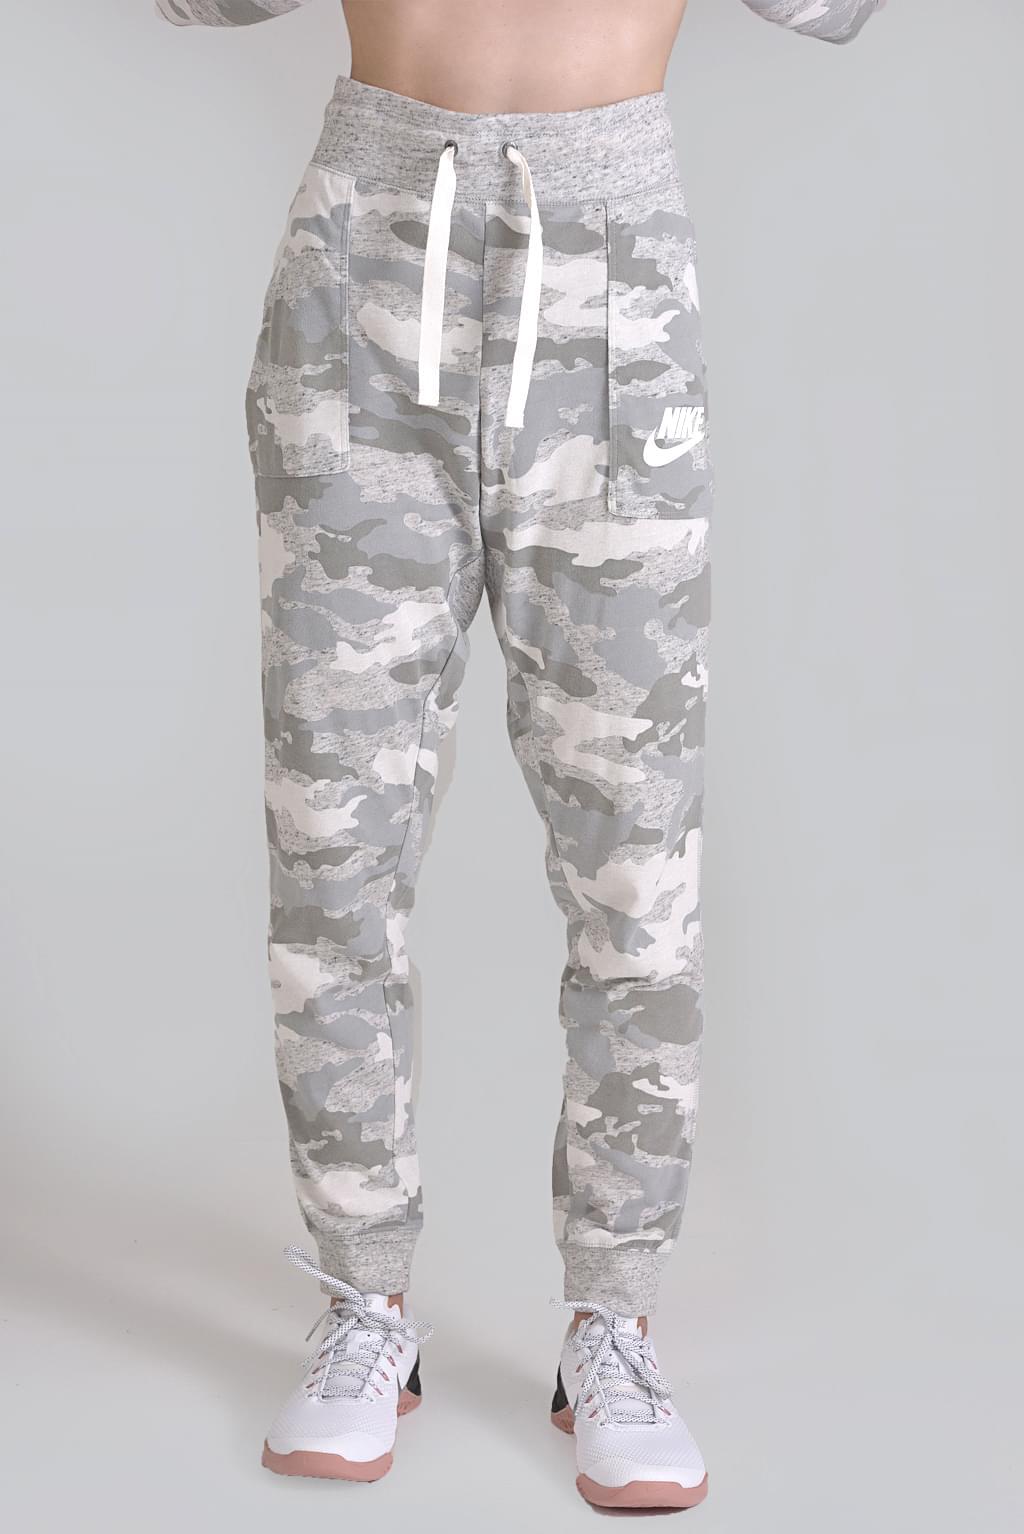 e4e212a8944f Playersroom   W NSW GYM VNTG PANT CAMO   Clothing   Trousers ...